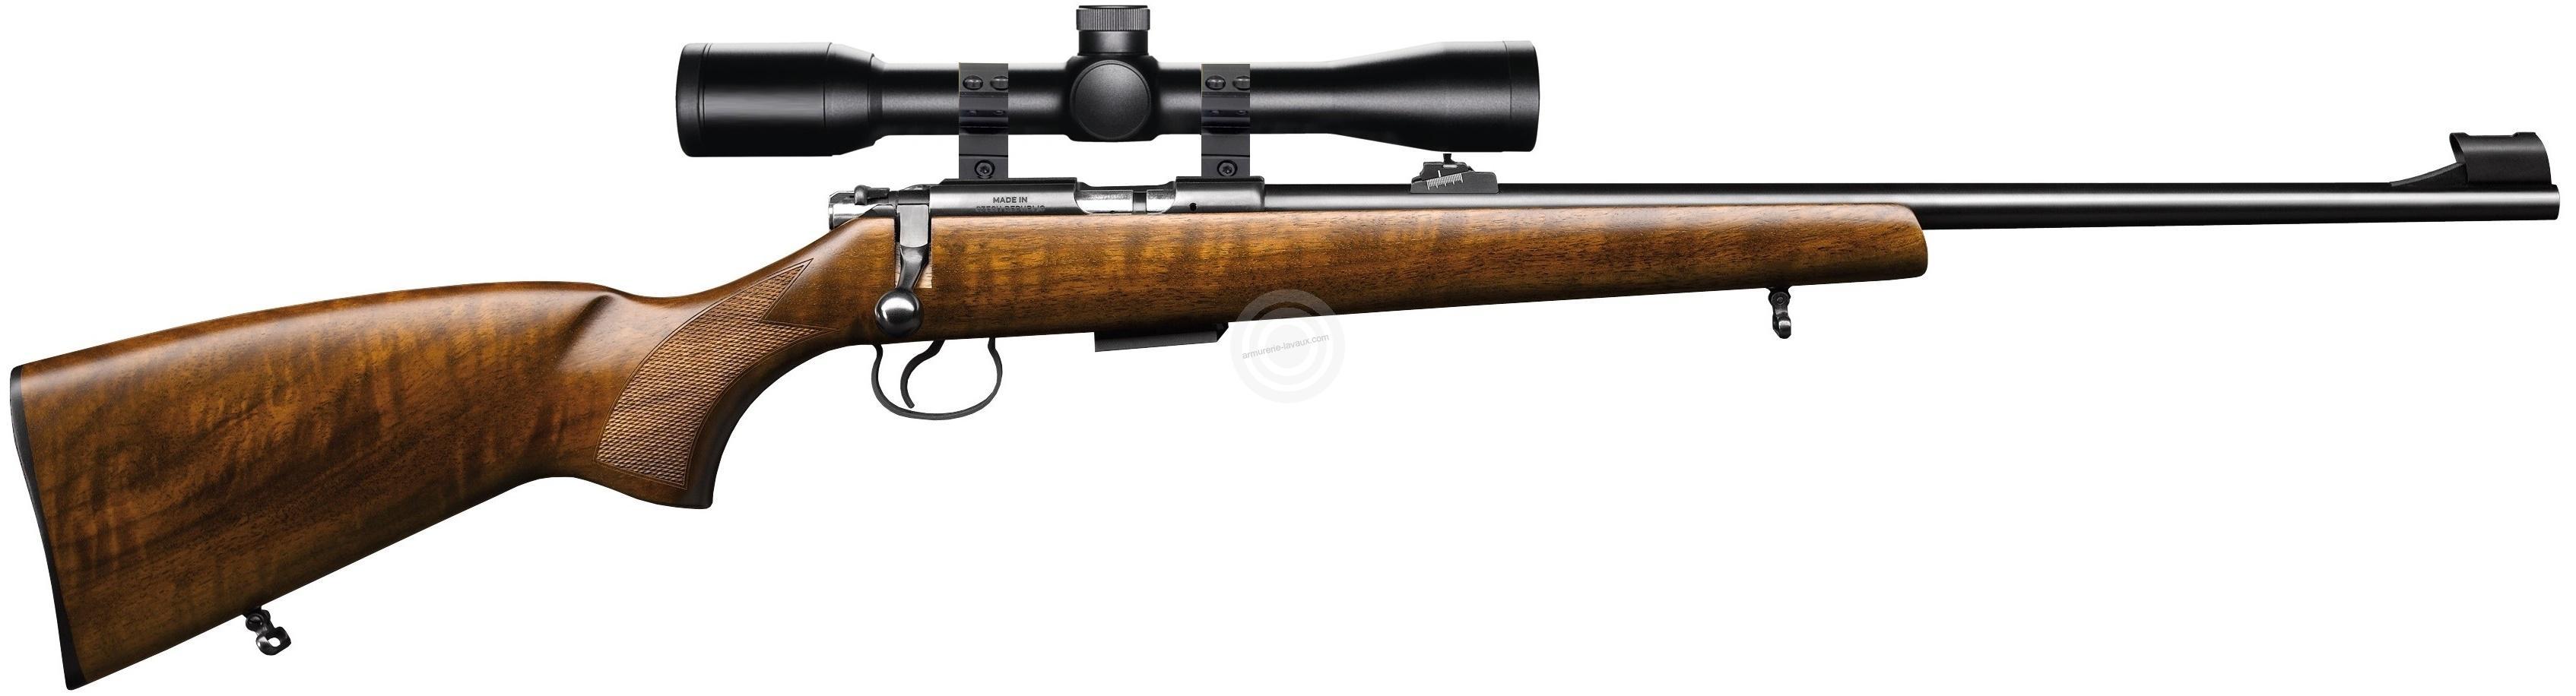 Carabine 22LR CZ 455 Luxe